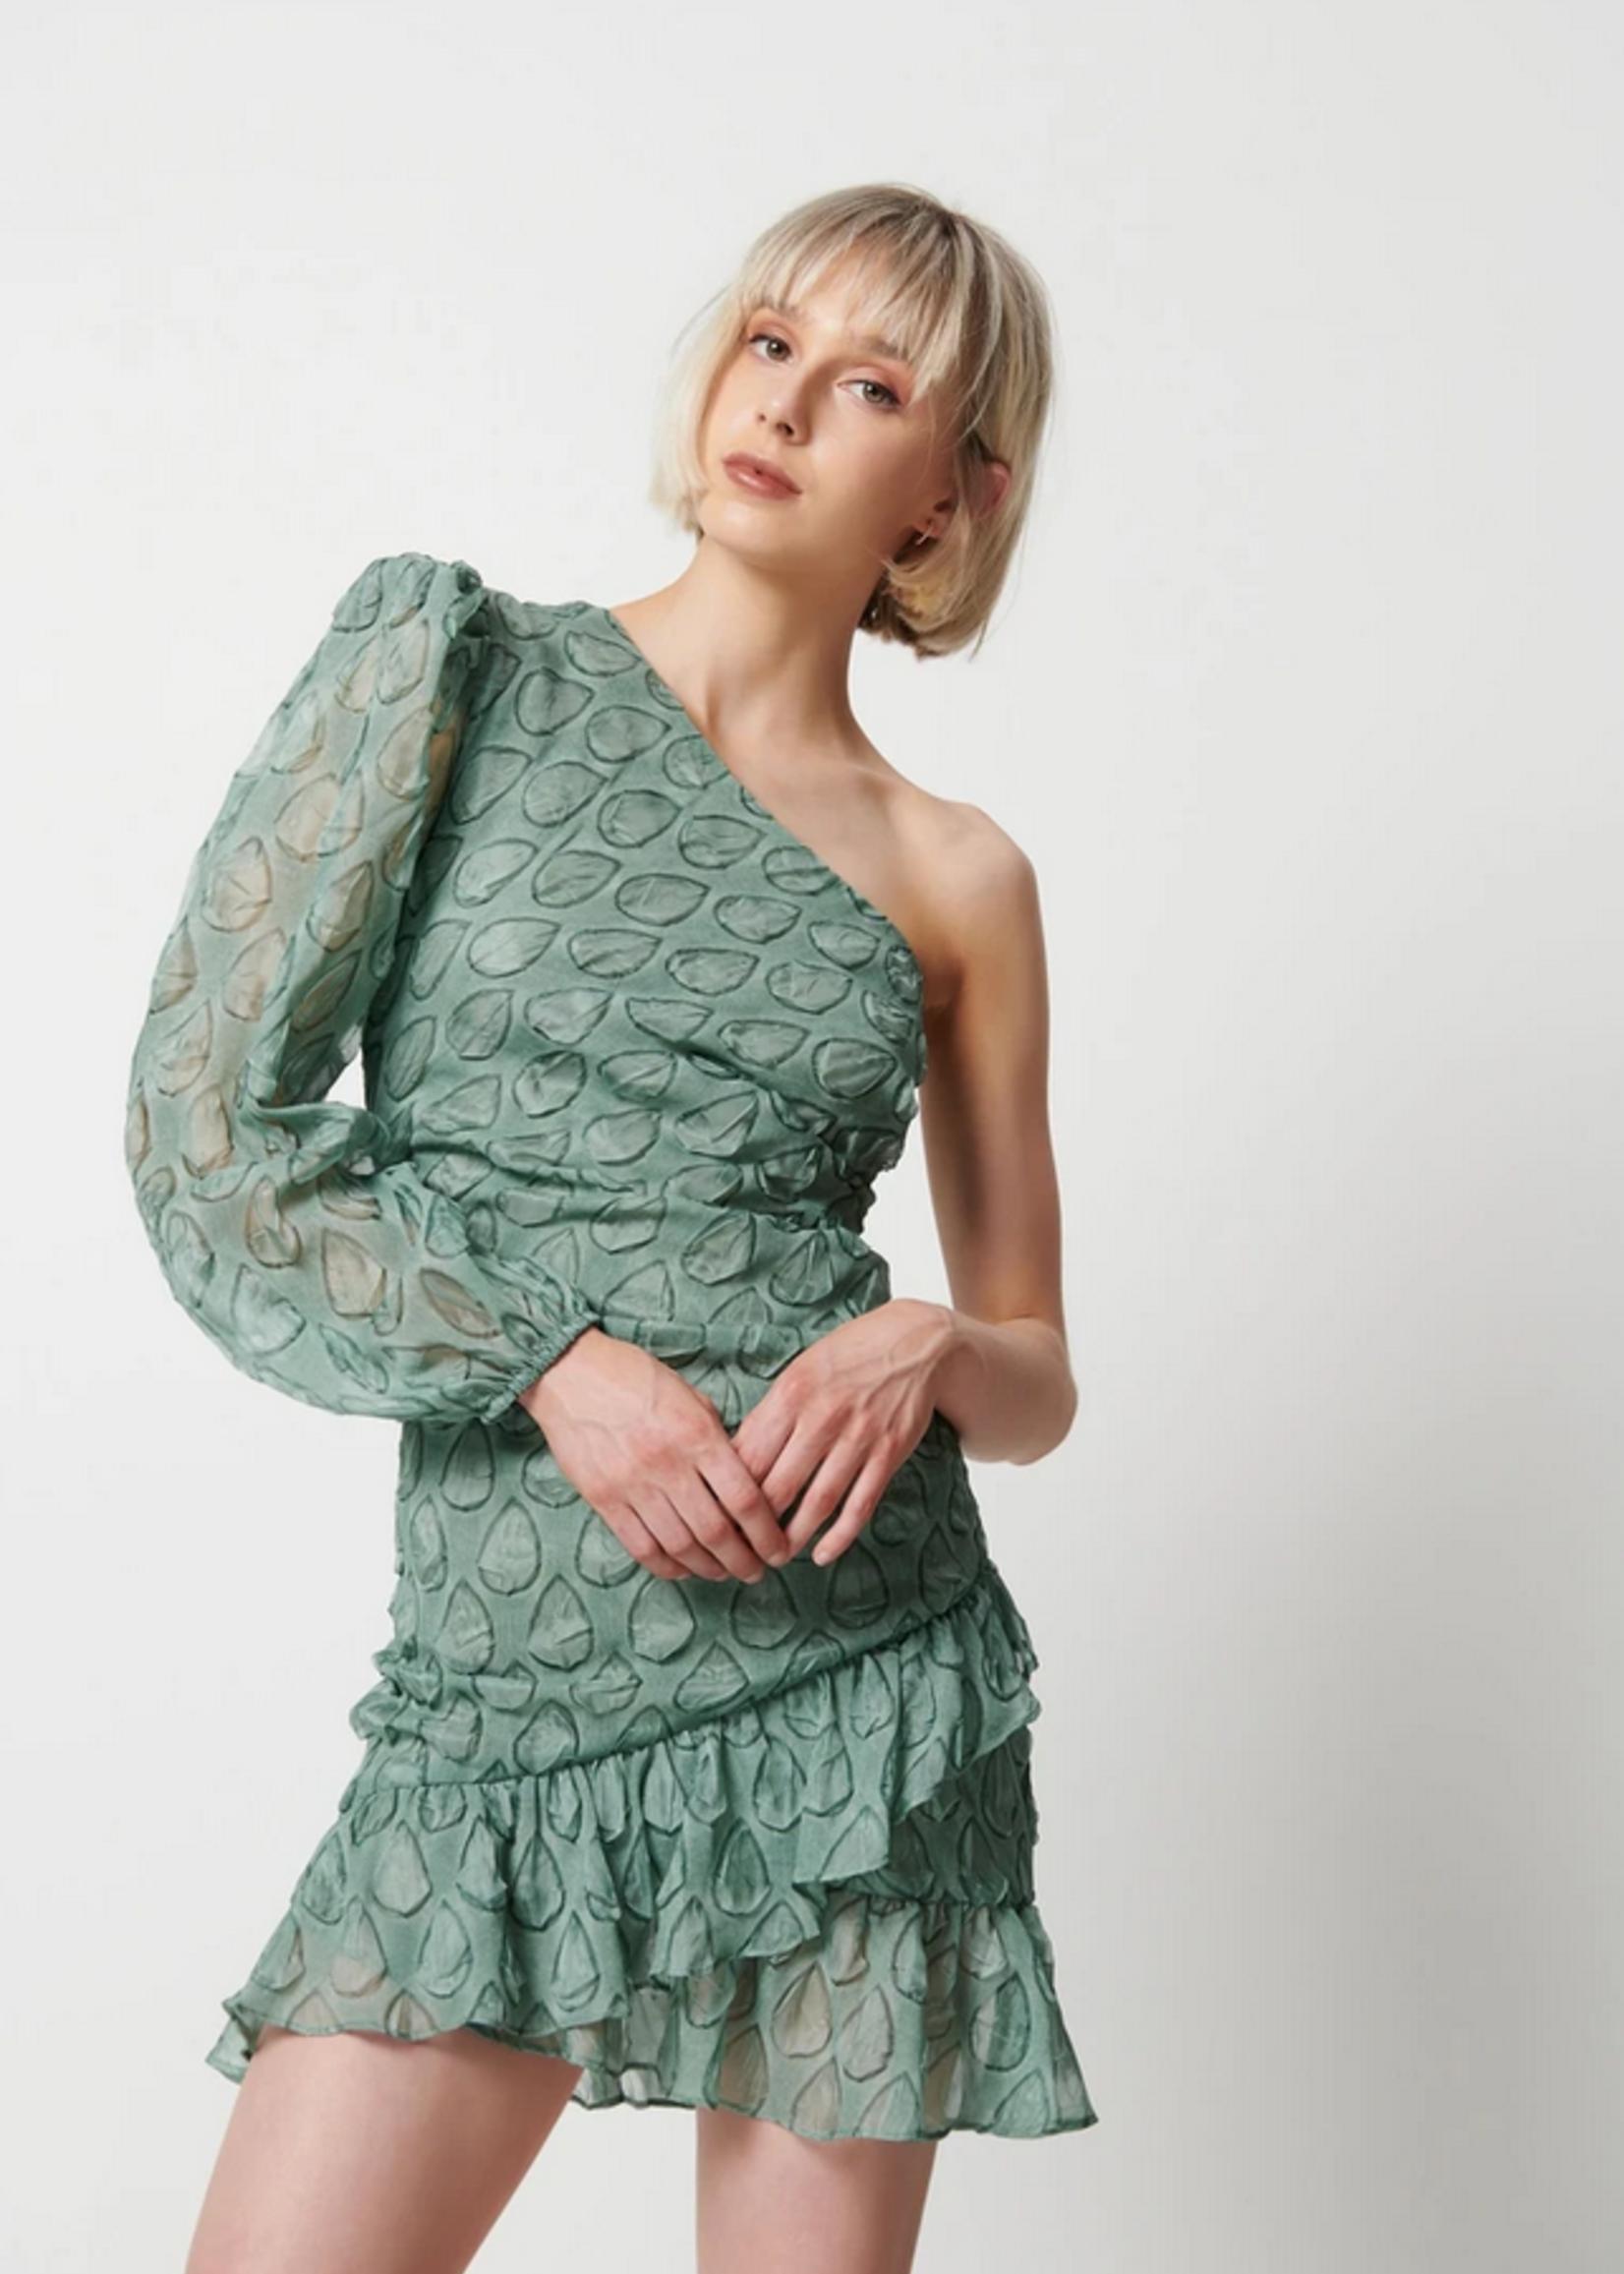 Elitaire Boutique Kakadu Dress in Green